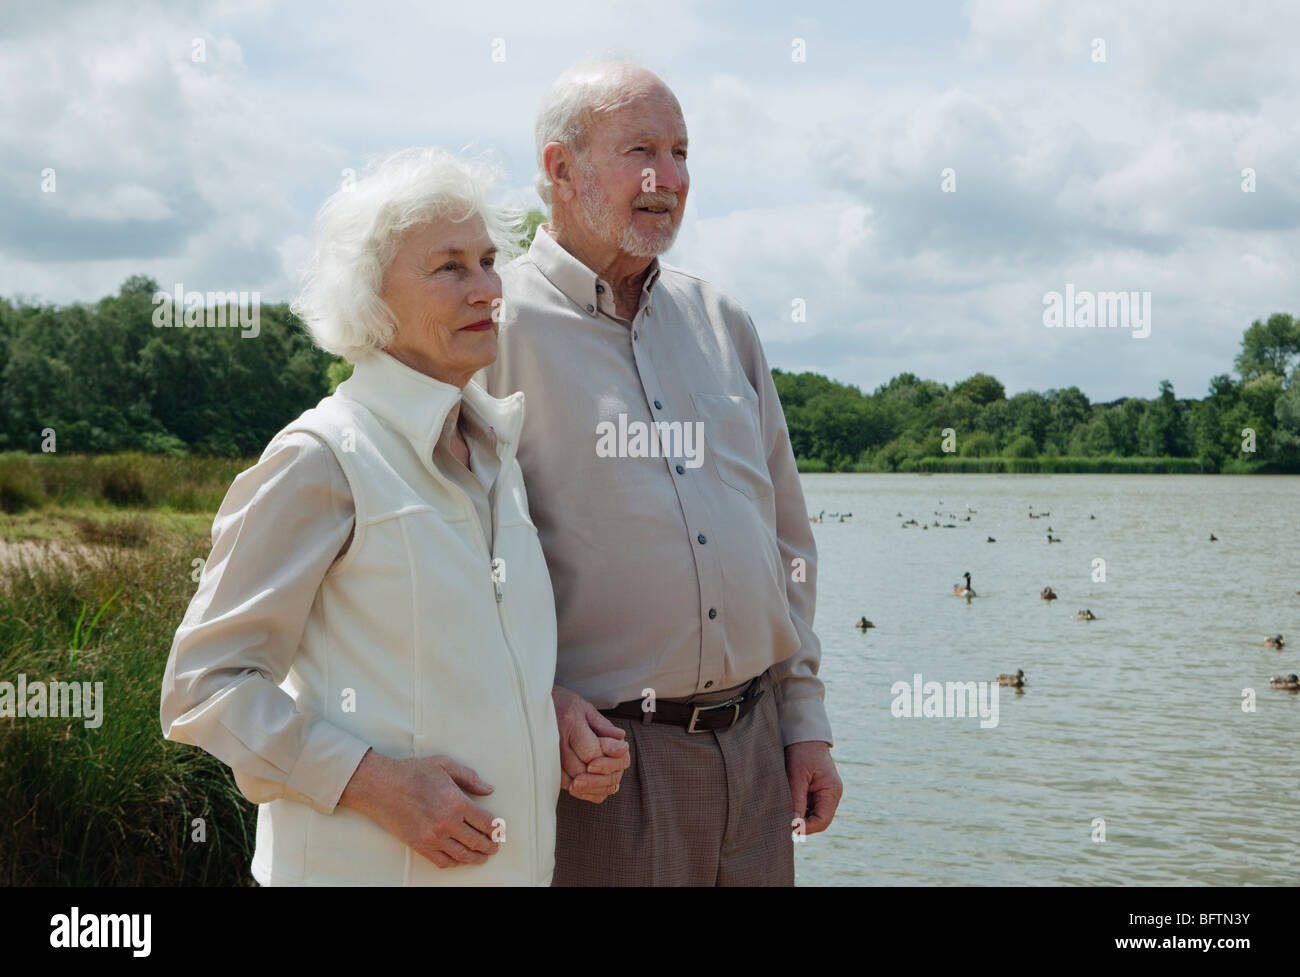 Elderly man holding elderly woman's hand - Stock Image